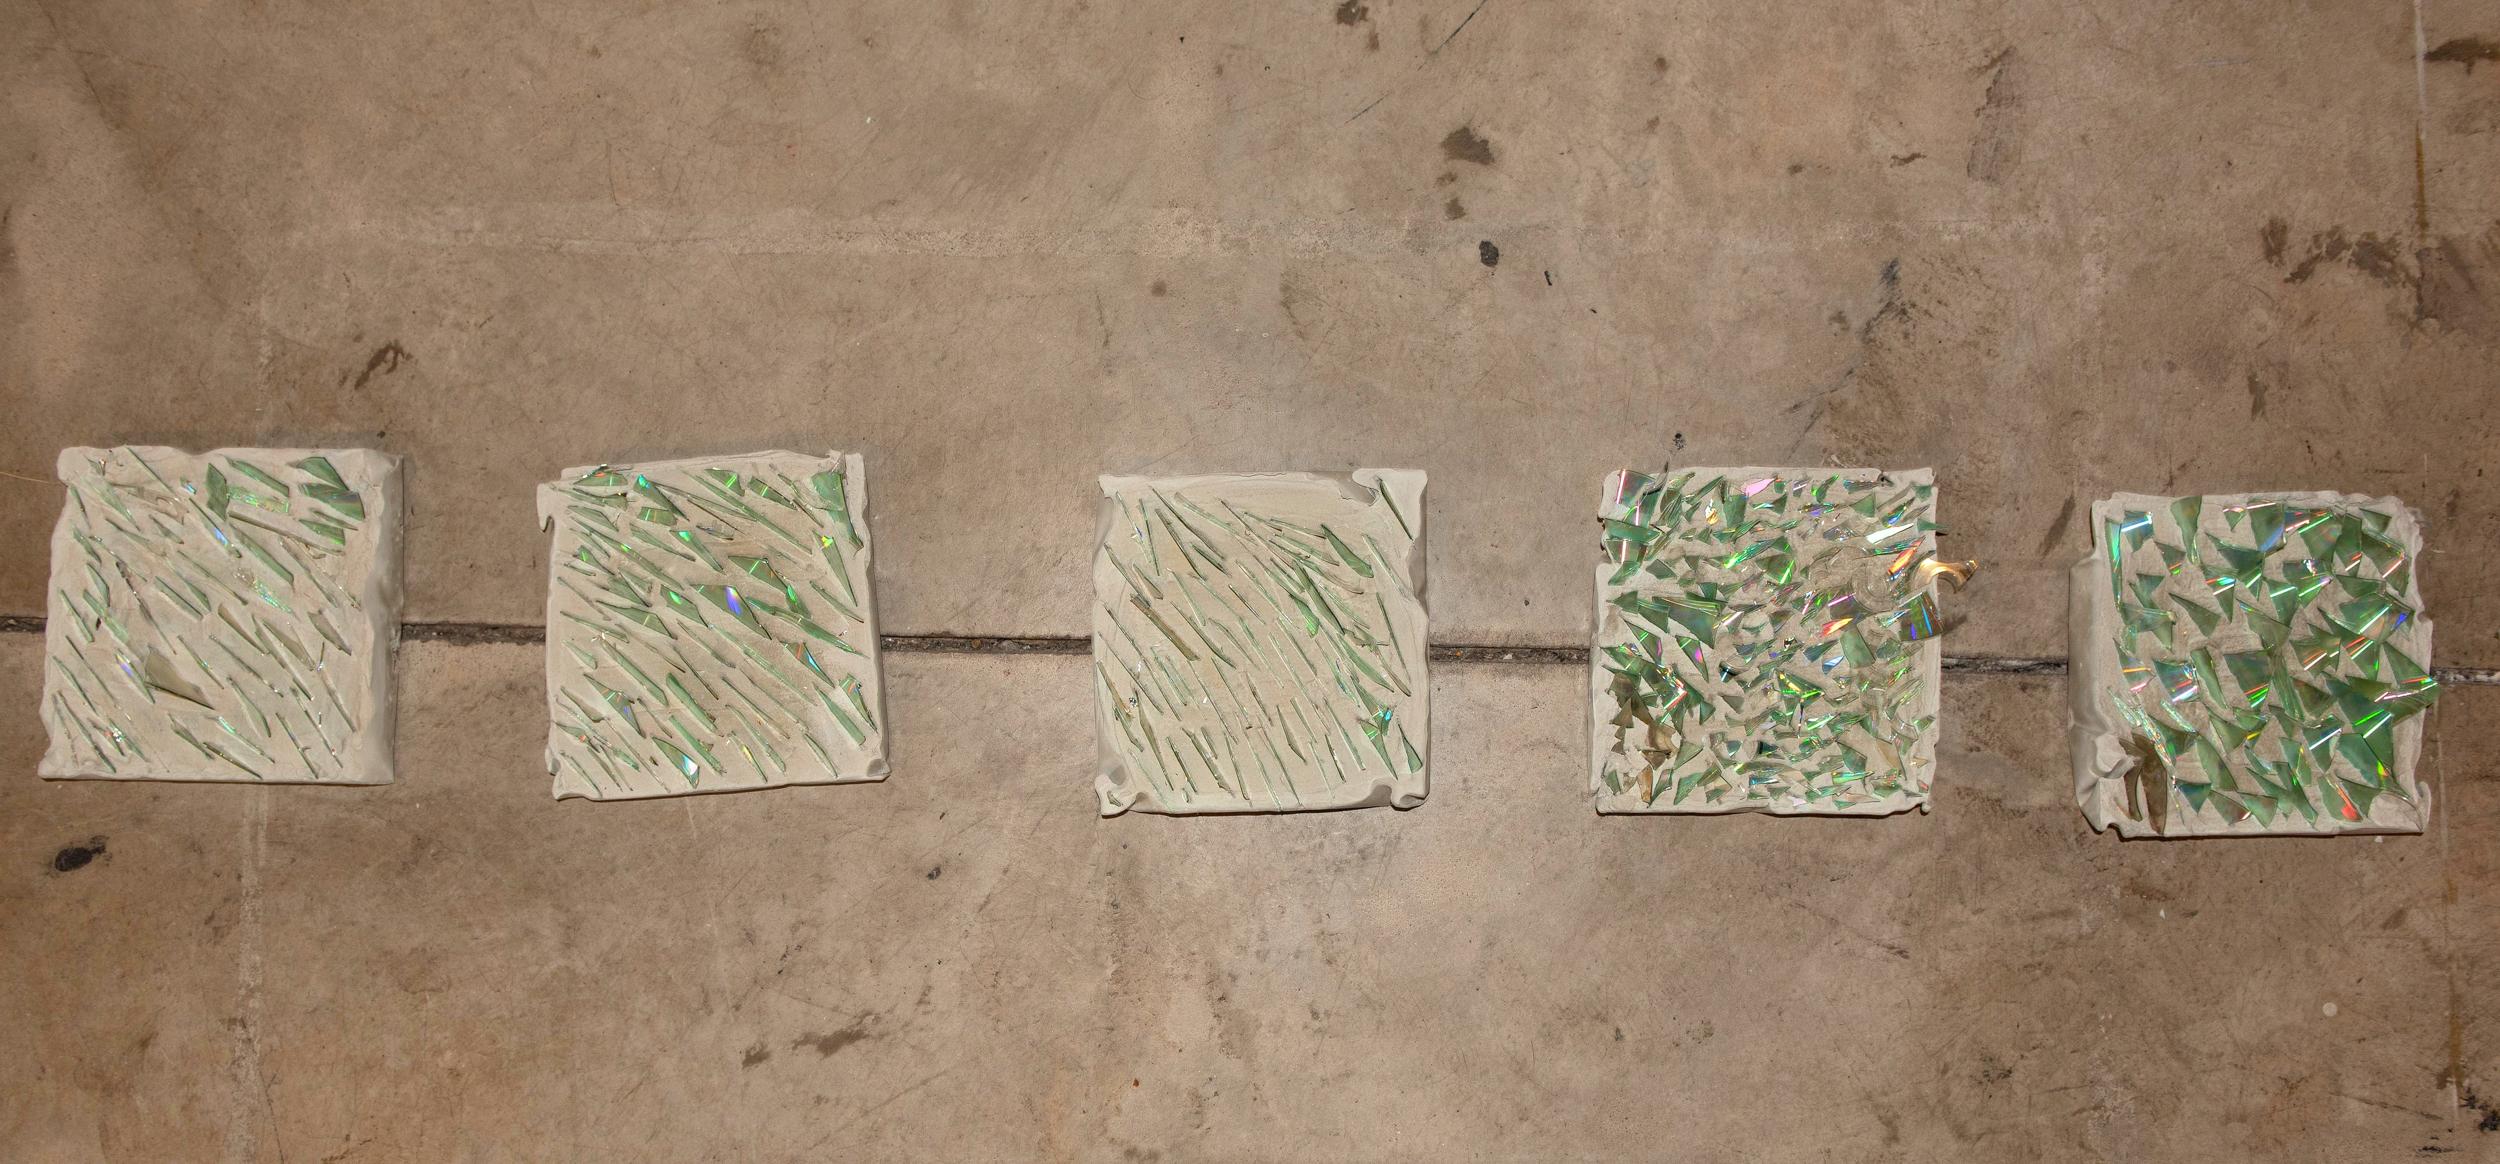 Glass Foot Megan Burchett and Maddie Zerkel Minneapolis, MN Cement with broken CDs 2018 $100 each